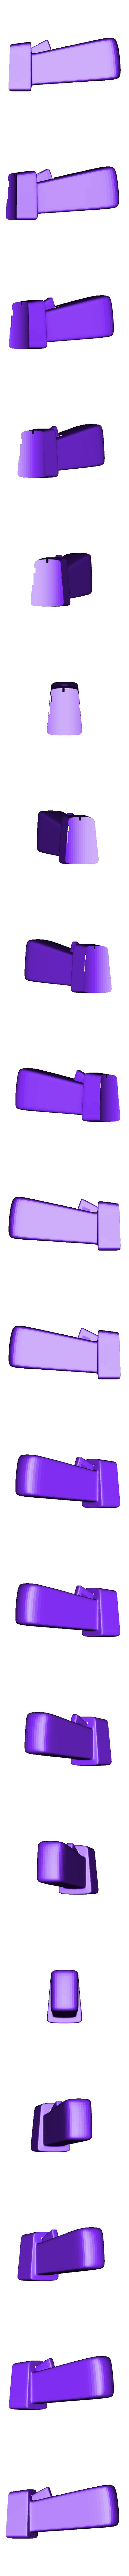 MegaC.obj Download free OBJ file Among Us (easy print)(crew/body/ghost/impostor) • 3D printable template, devanborkhatria